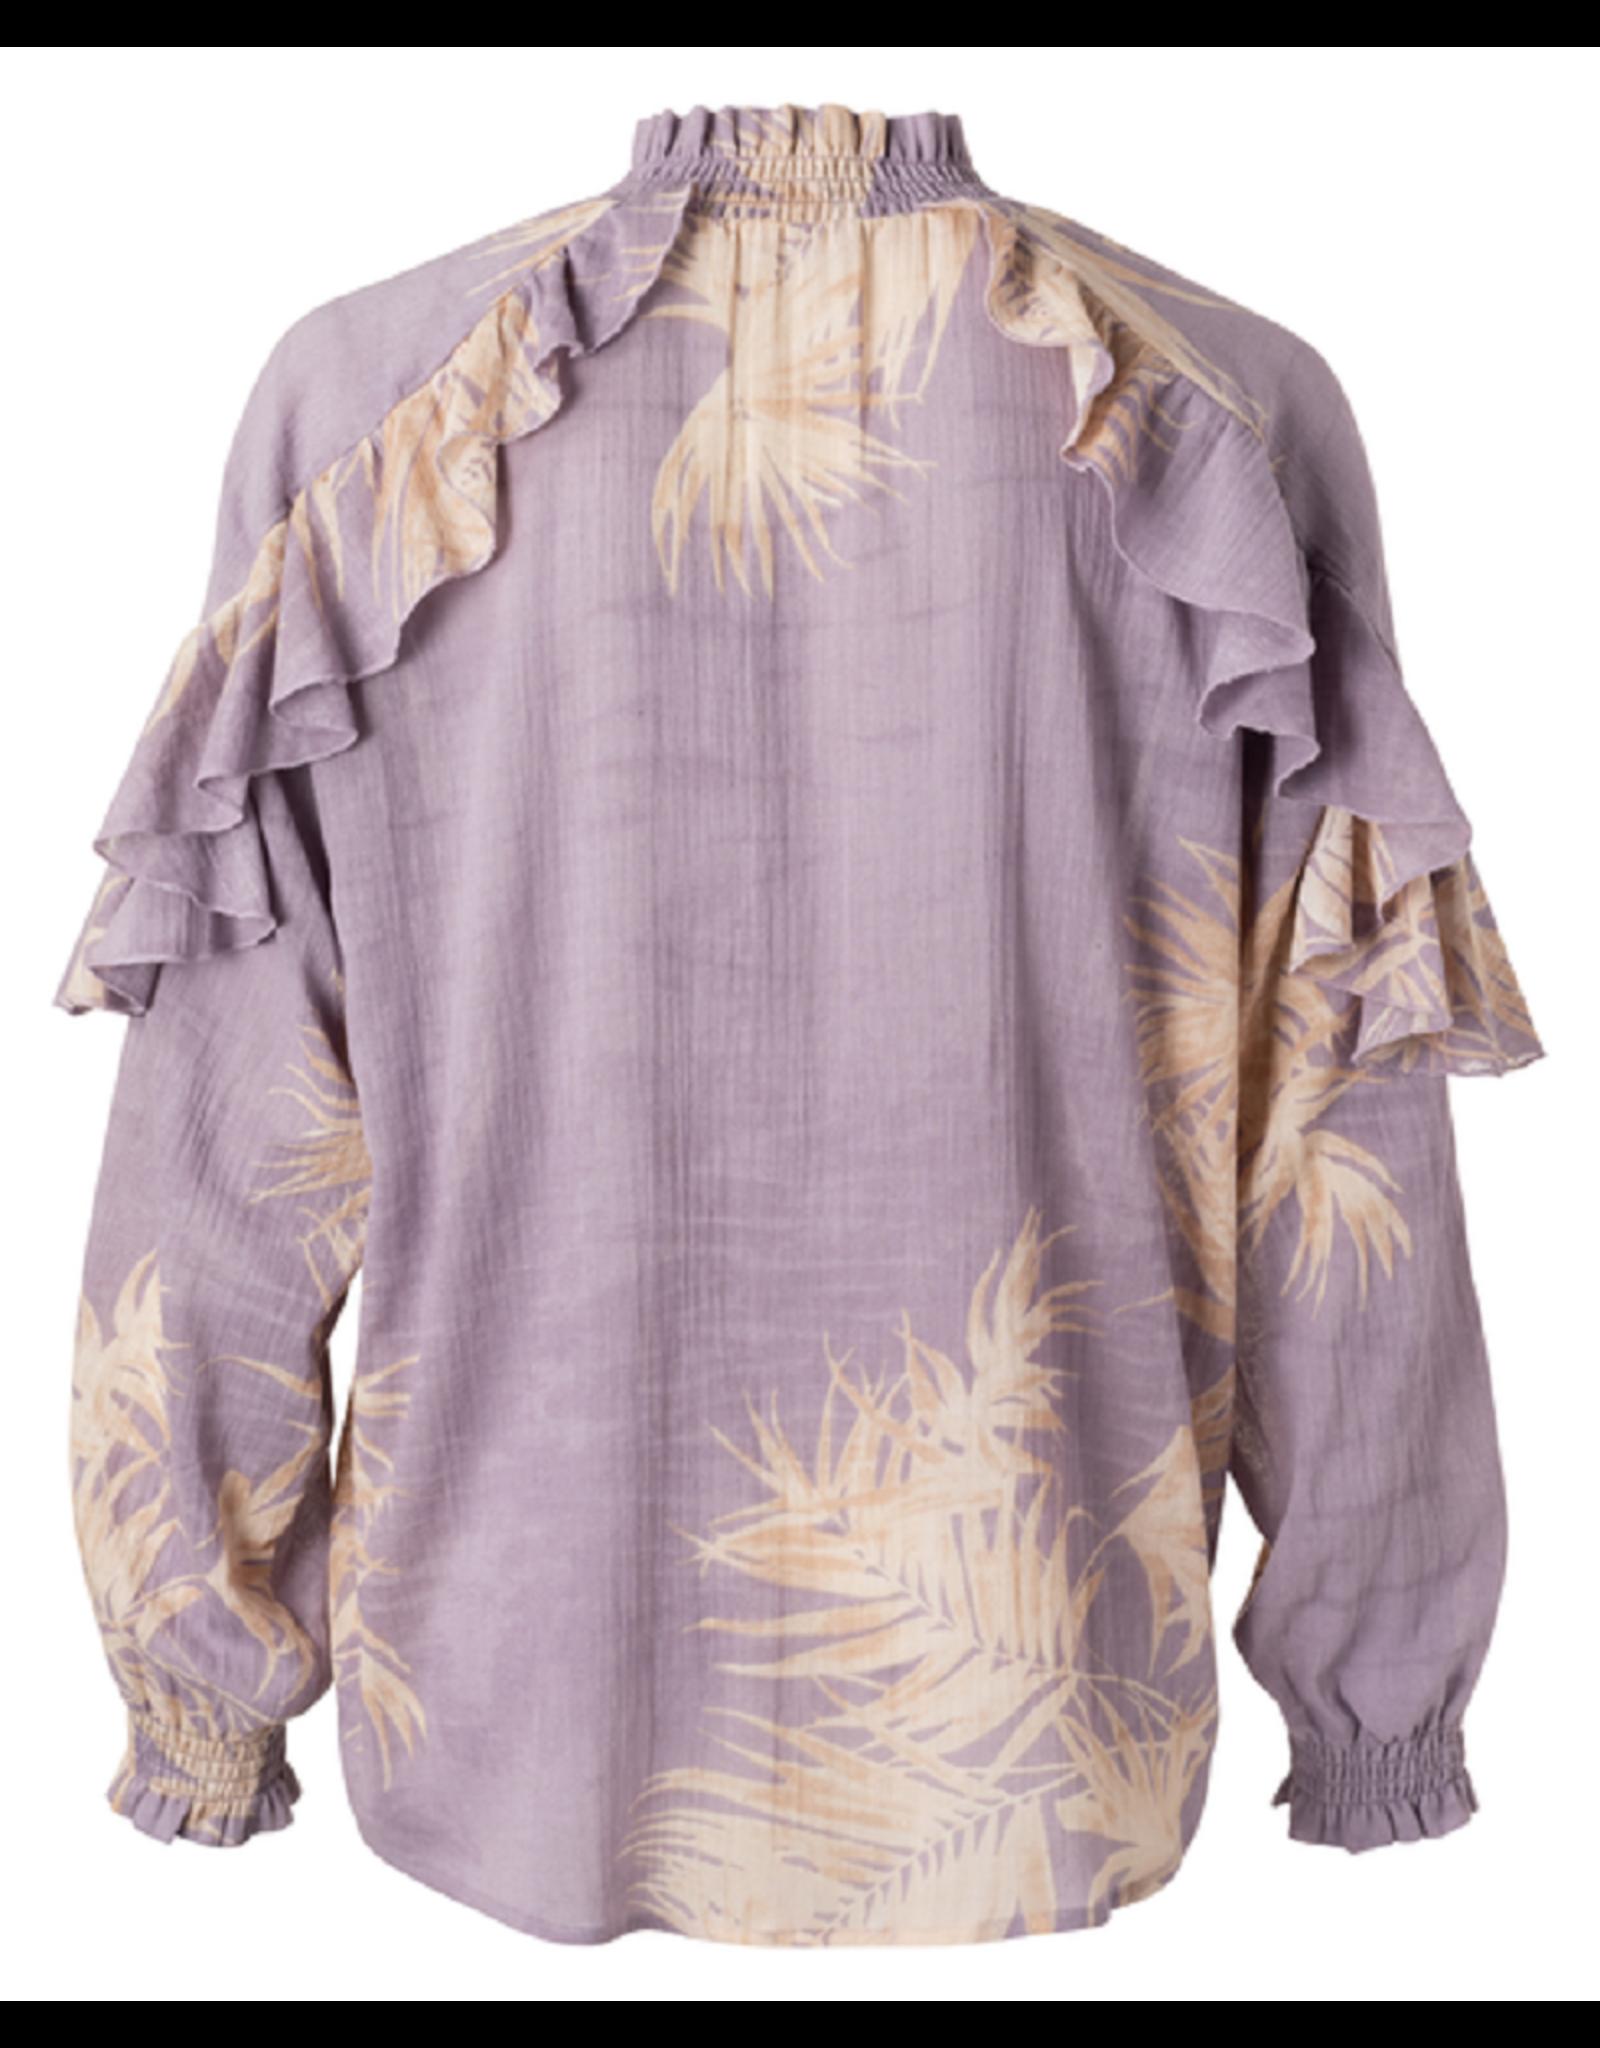 YAYA YAYA Printed ruffles top lilac dessin